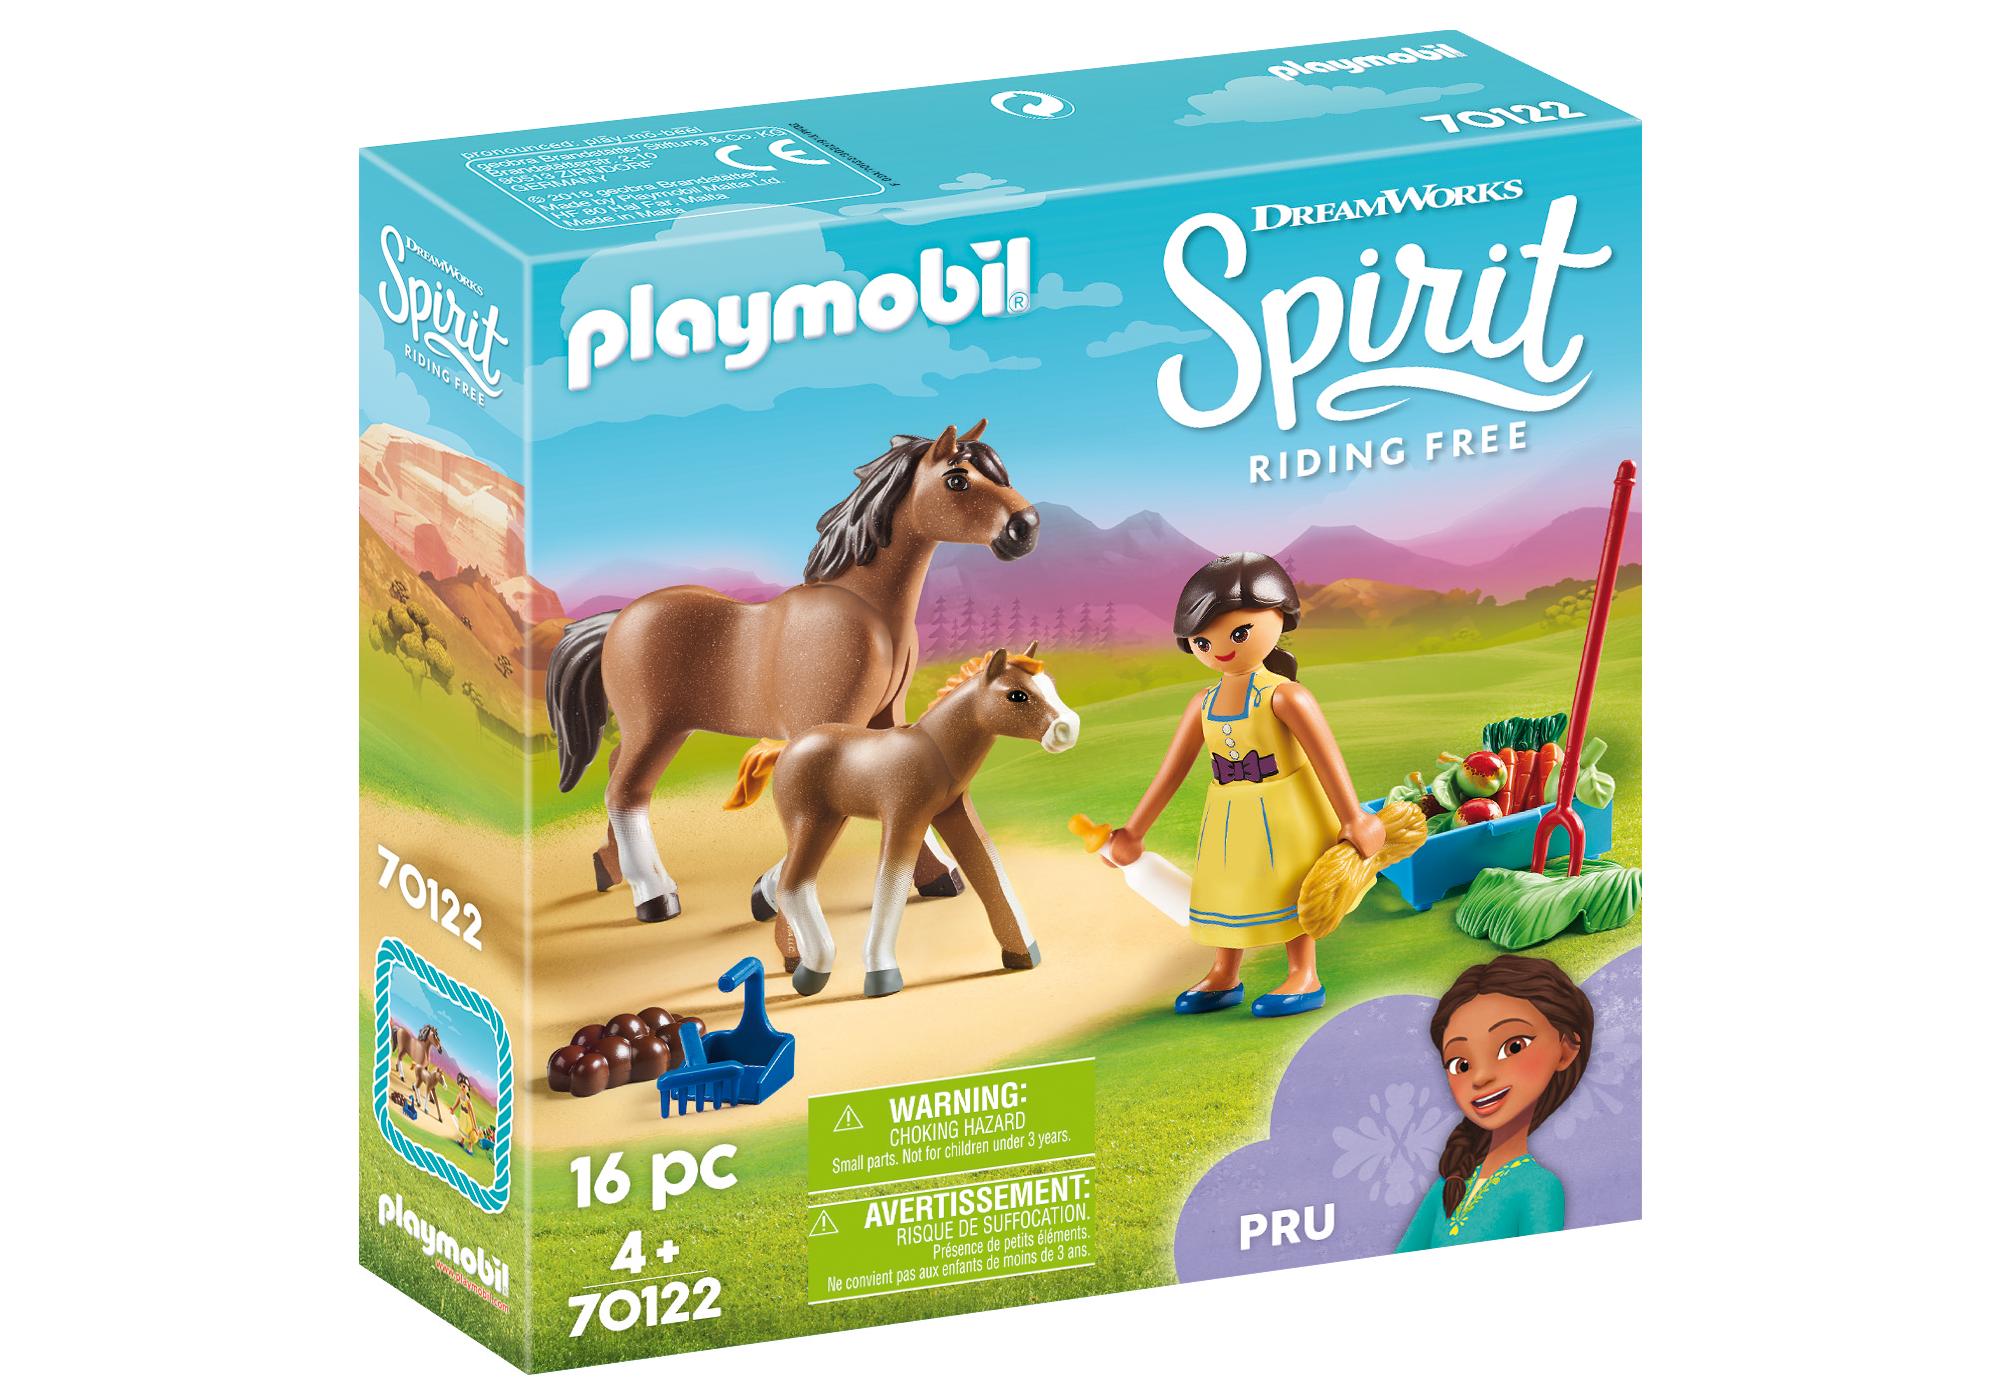 http://media.playmobil.com/i/playmobil/70122_product_box_front/Pru met paard en veulen